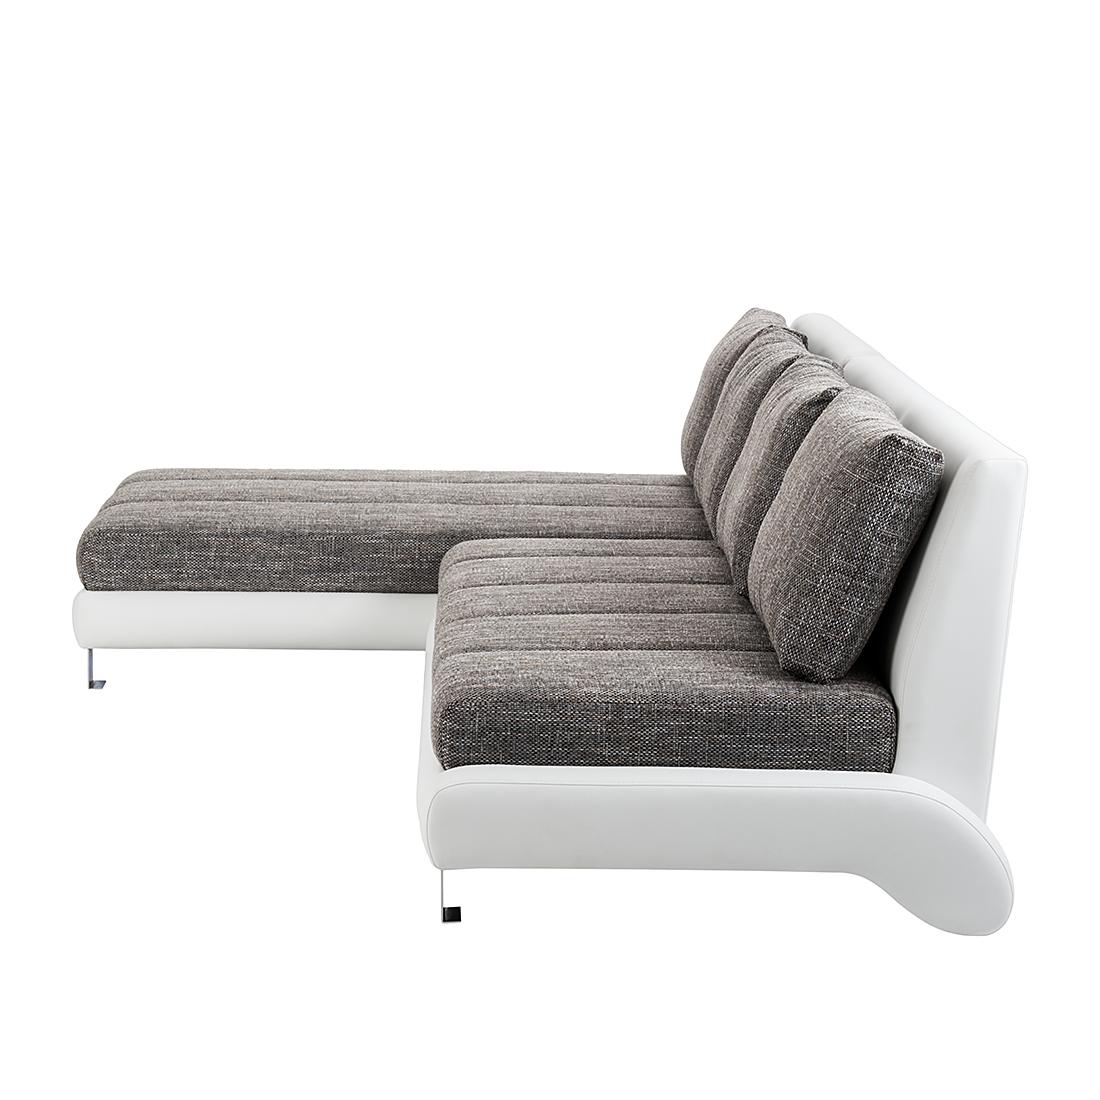 ecksofa stoff grau wei beige 3 sitzer sofa couch eckcouch. Black Bedroom Furniture Sets. Home Design Ideas